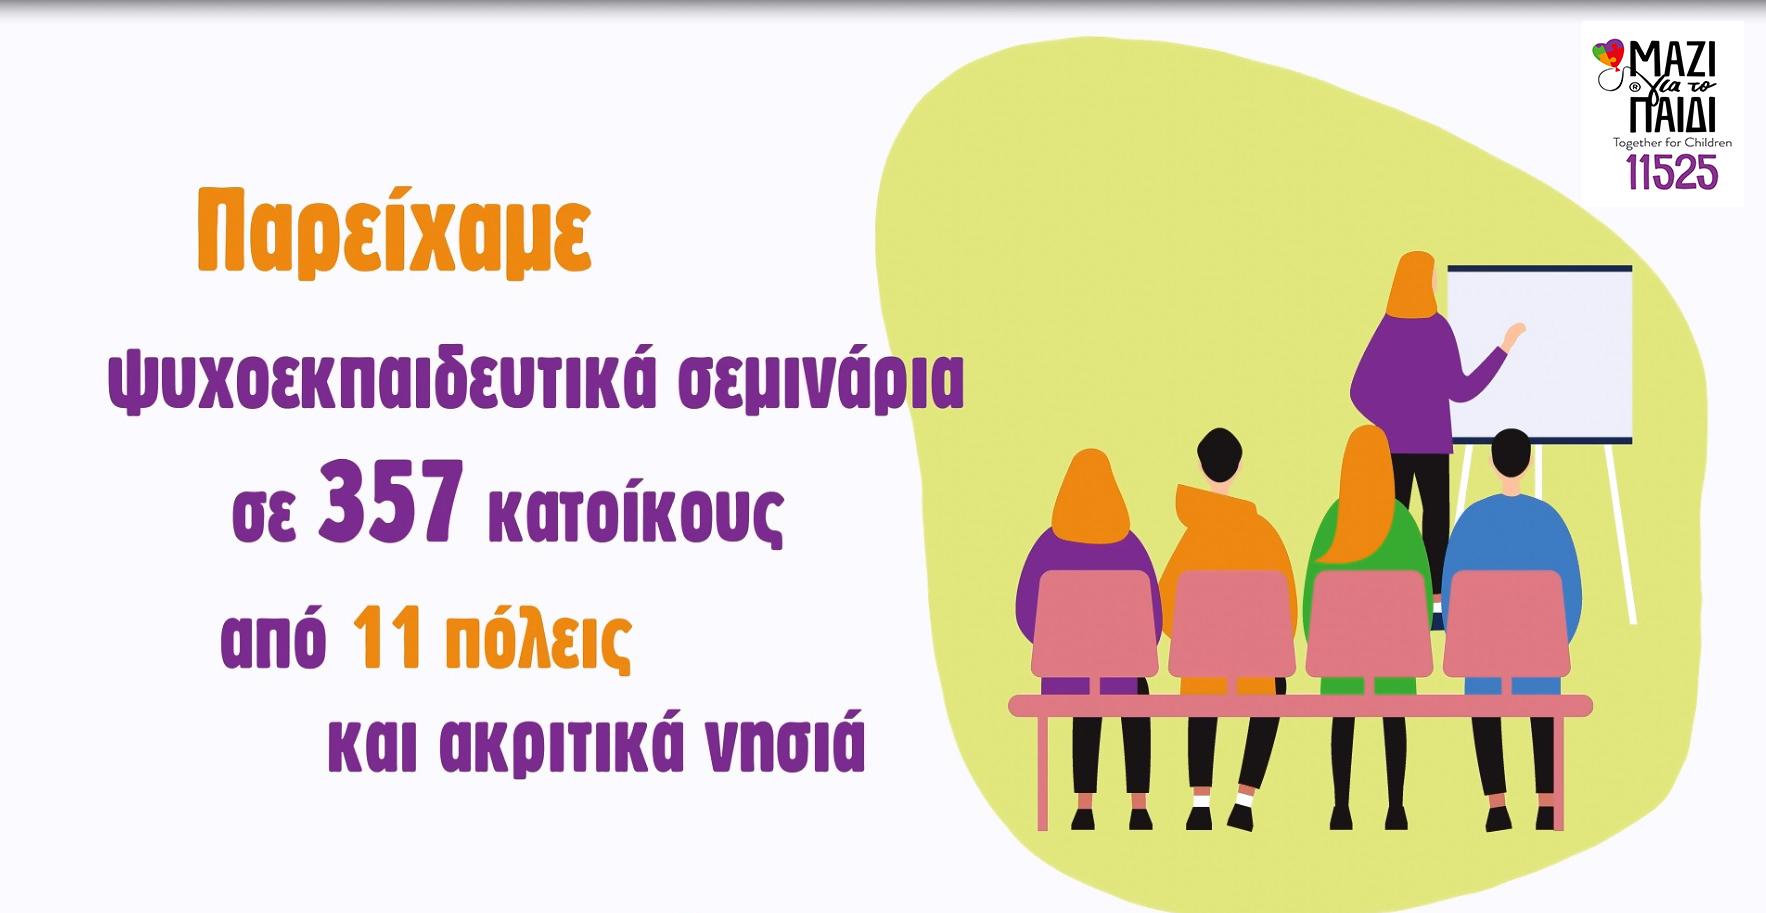 mazigiatopaidi infographics2019 2